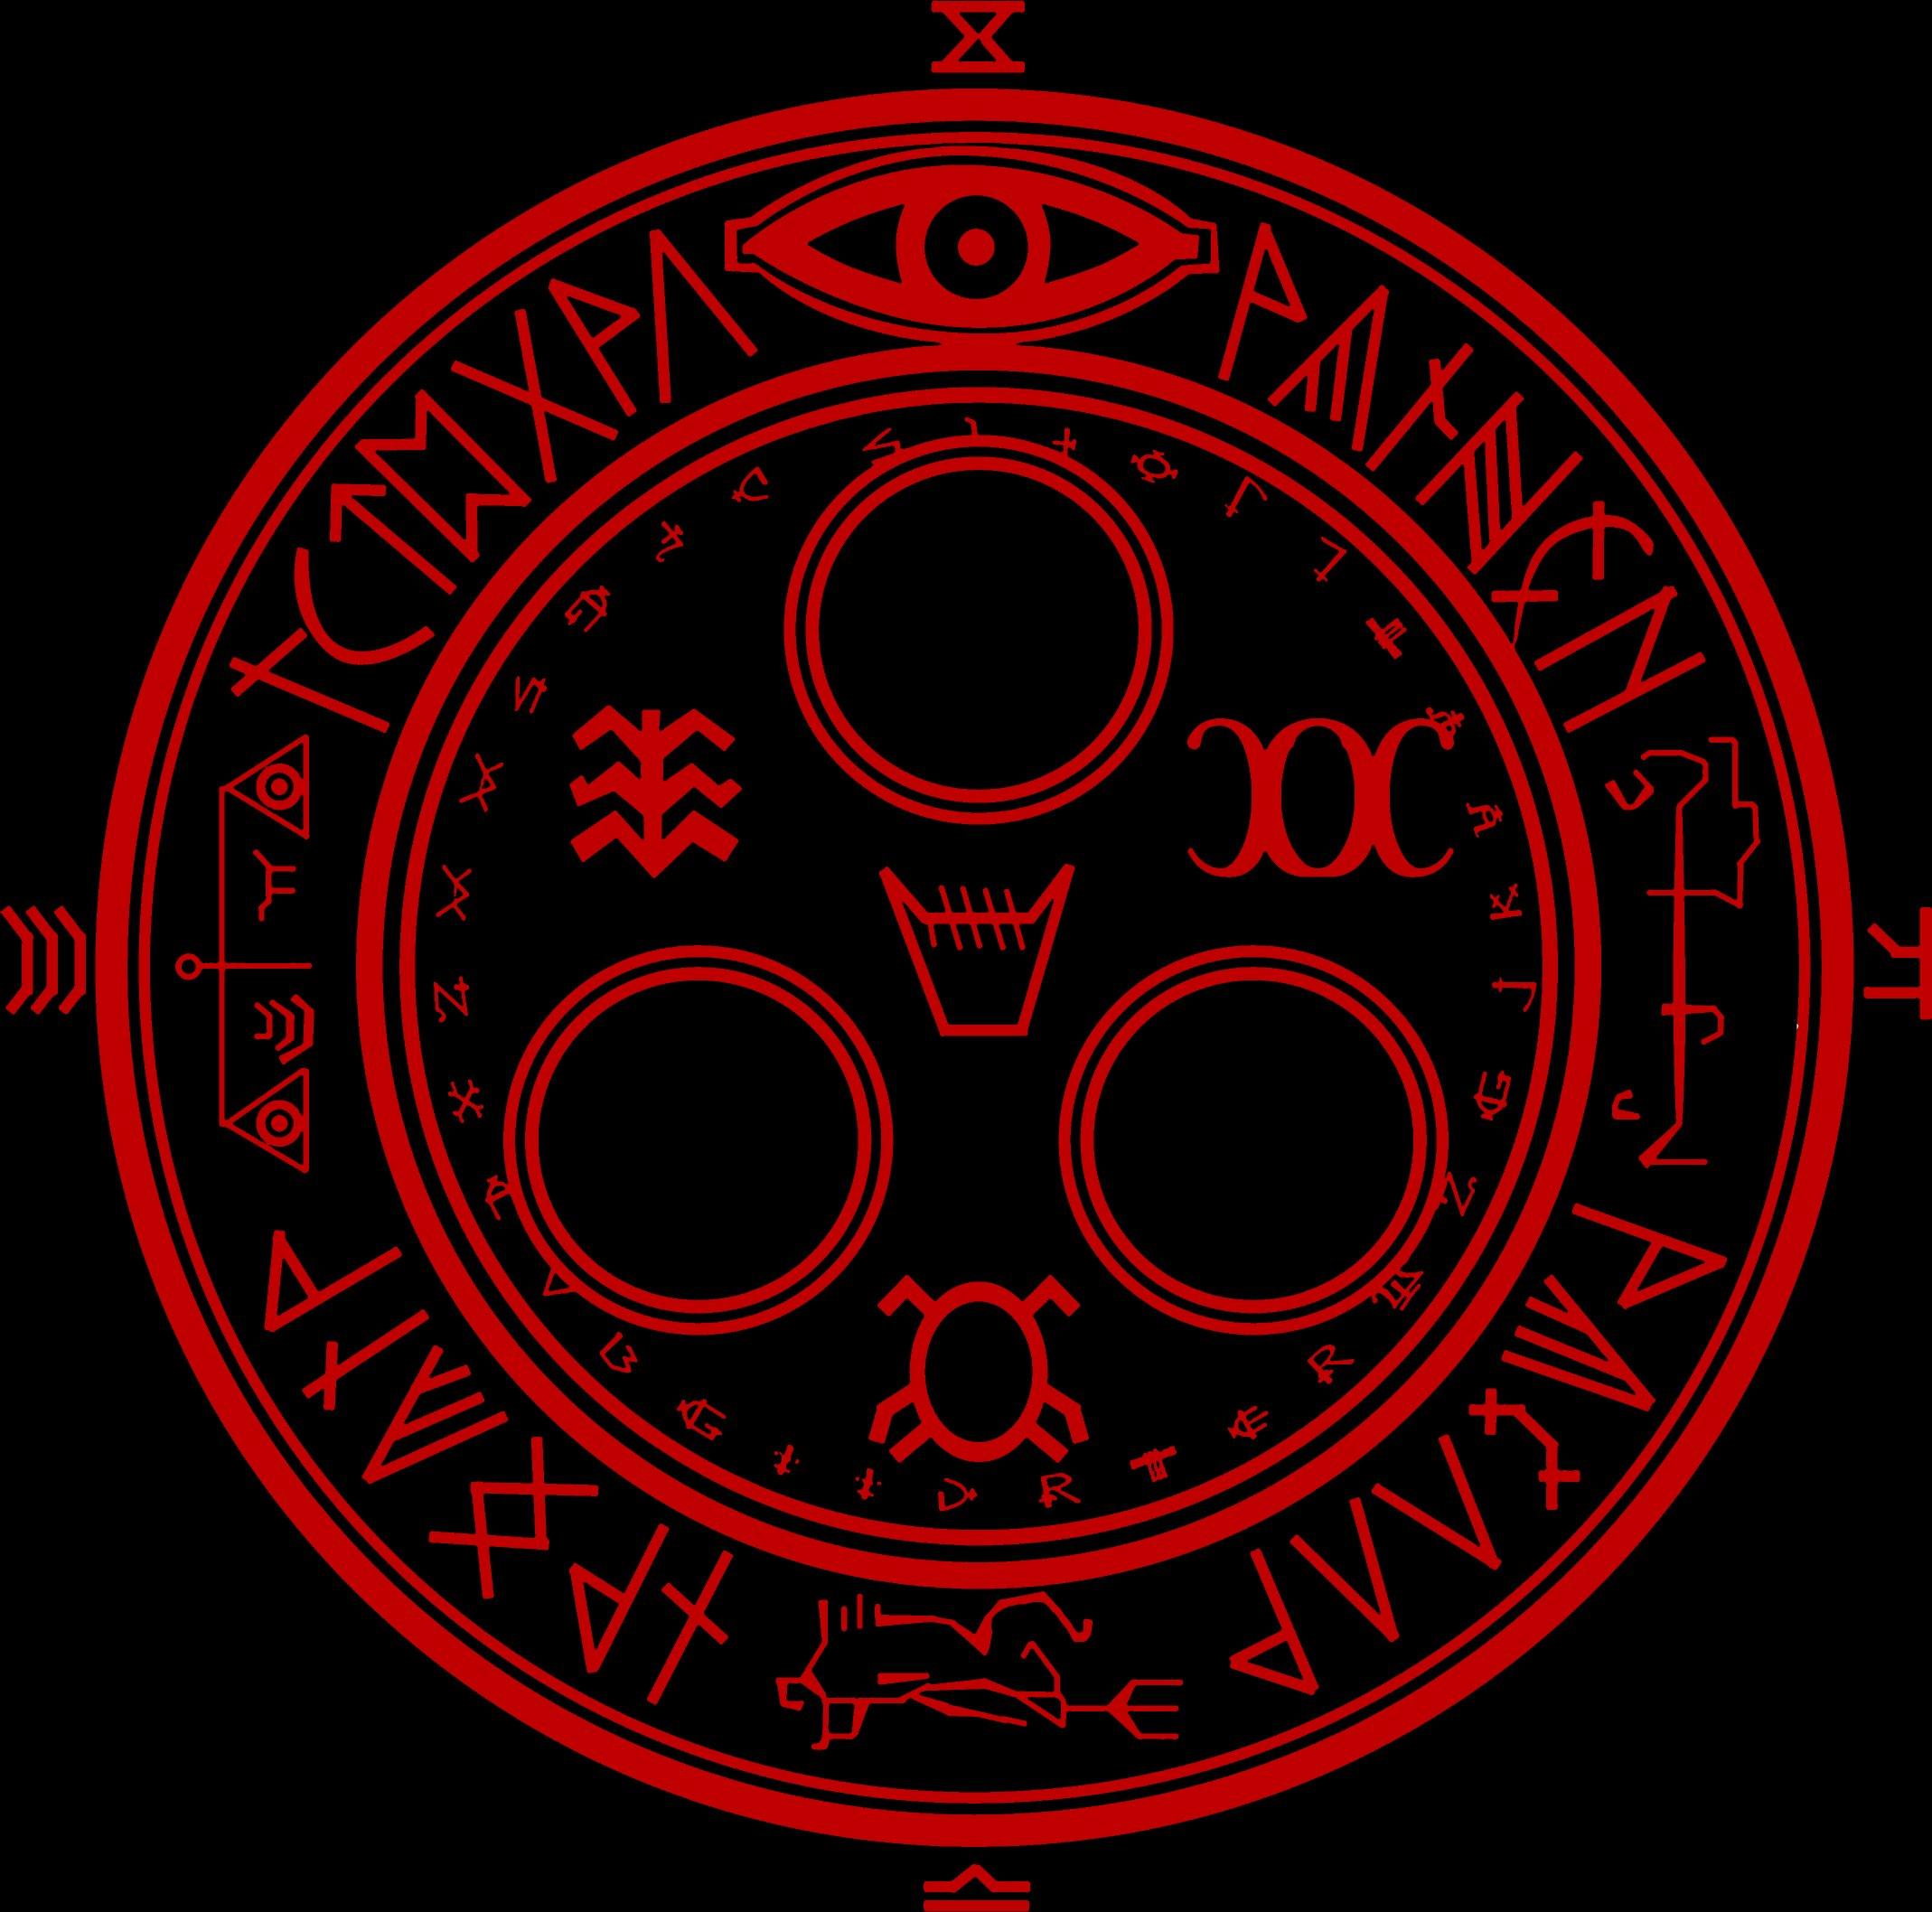 Sigil Of Lucifer Hd Wallpaper: Dark Horror Evil Occult Satan Satanic Creepy Wallpaper